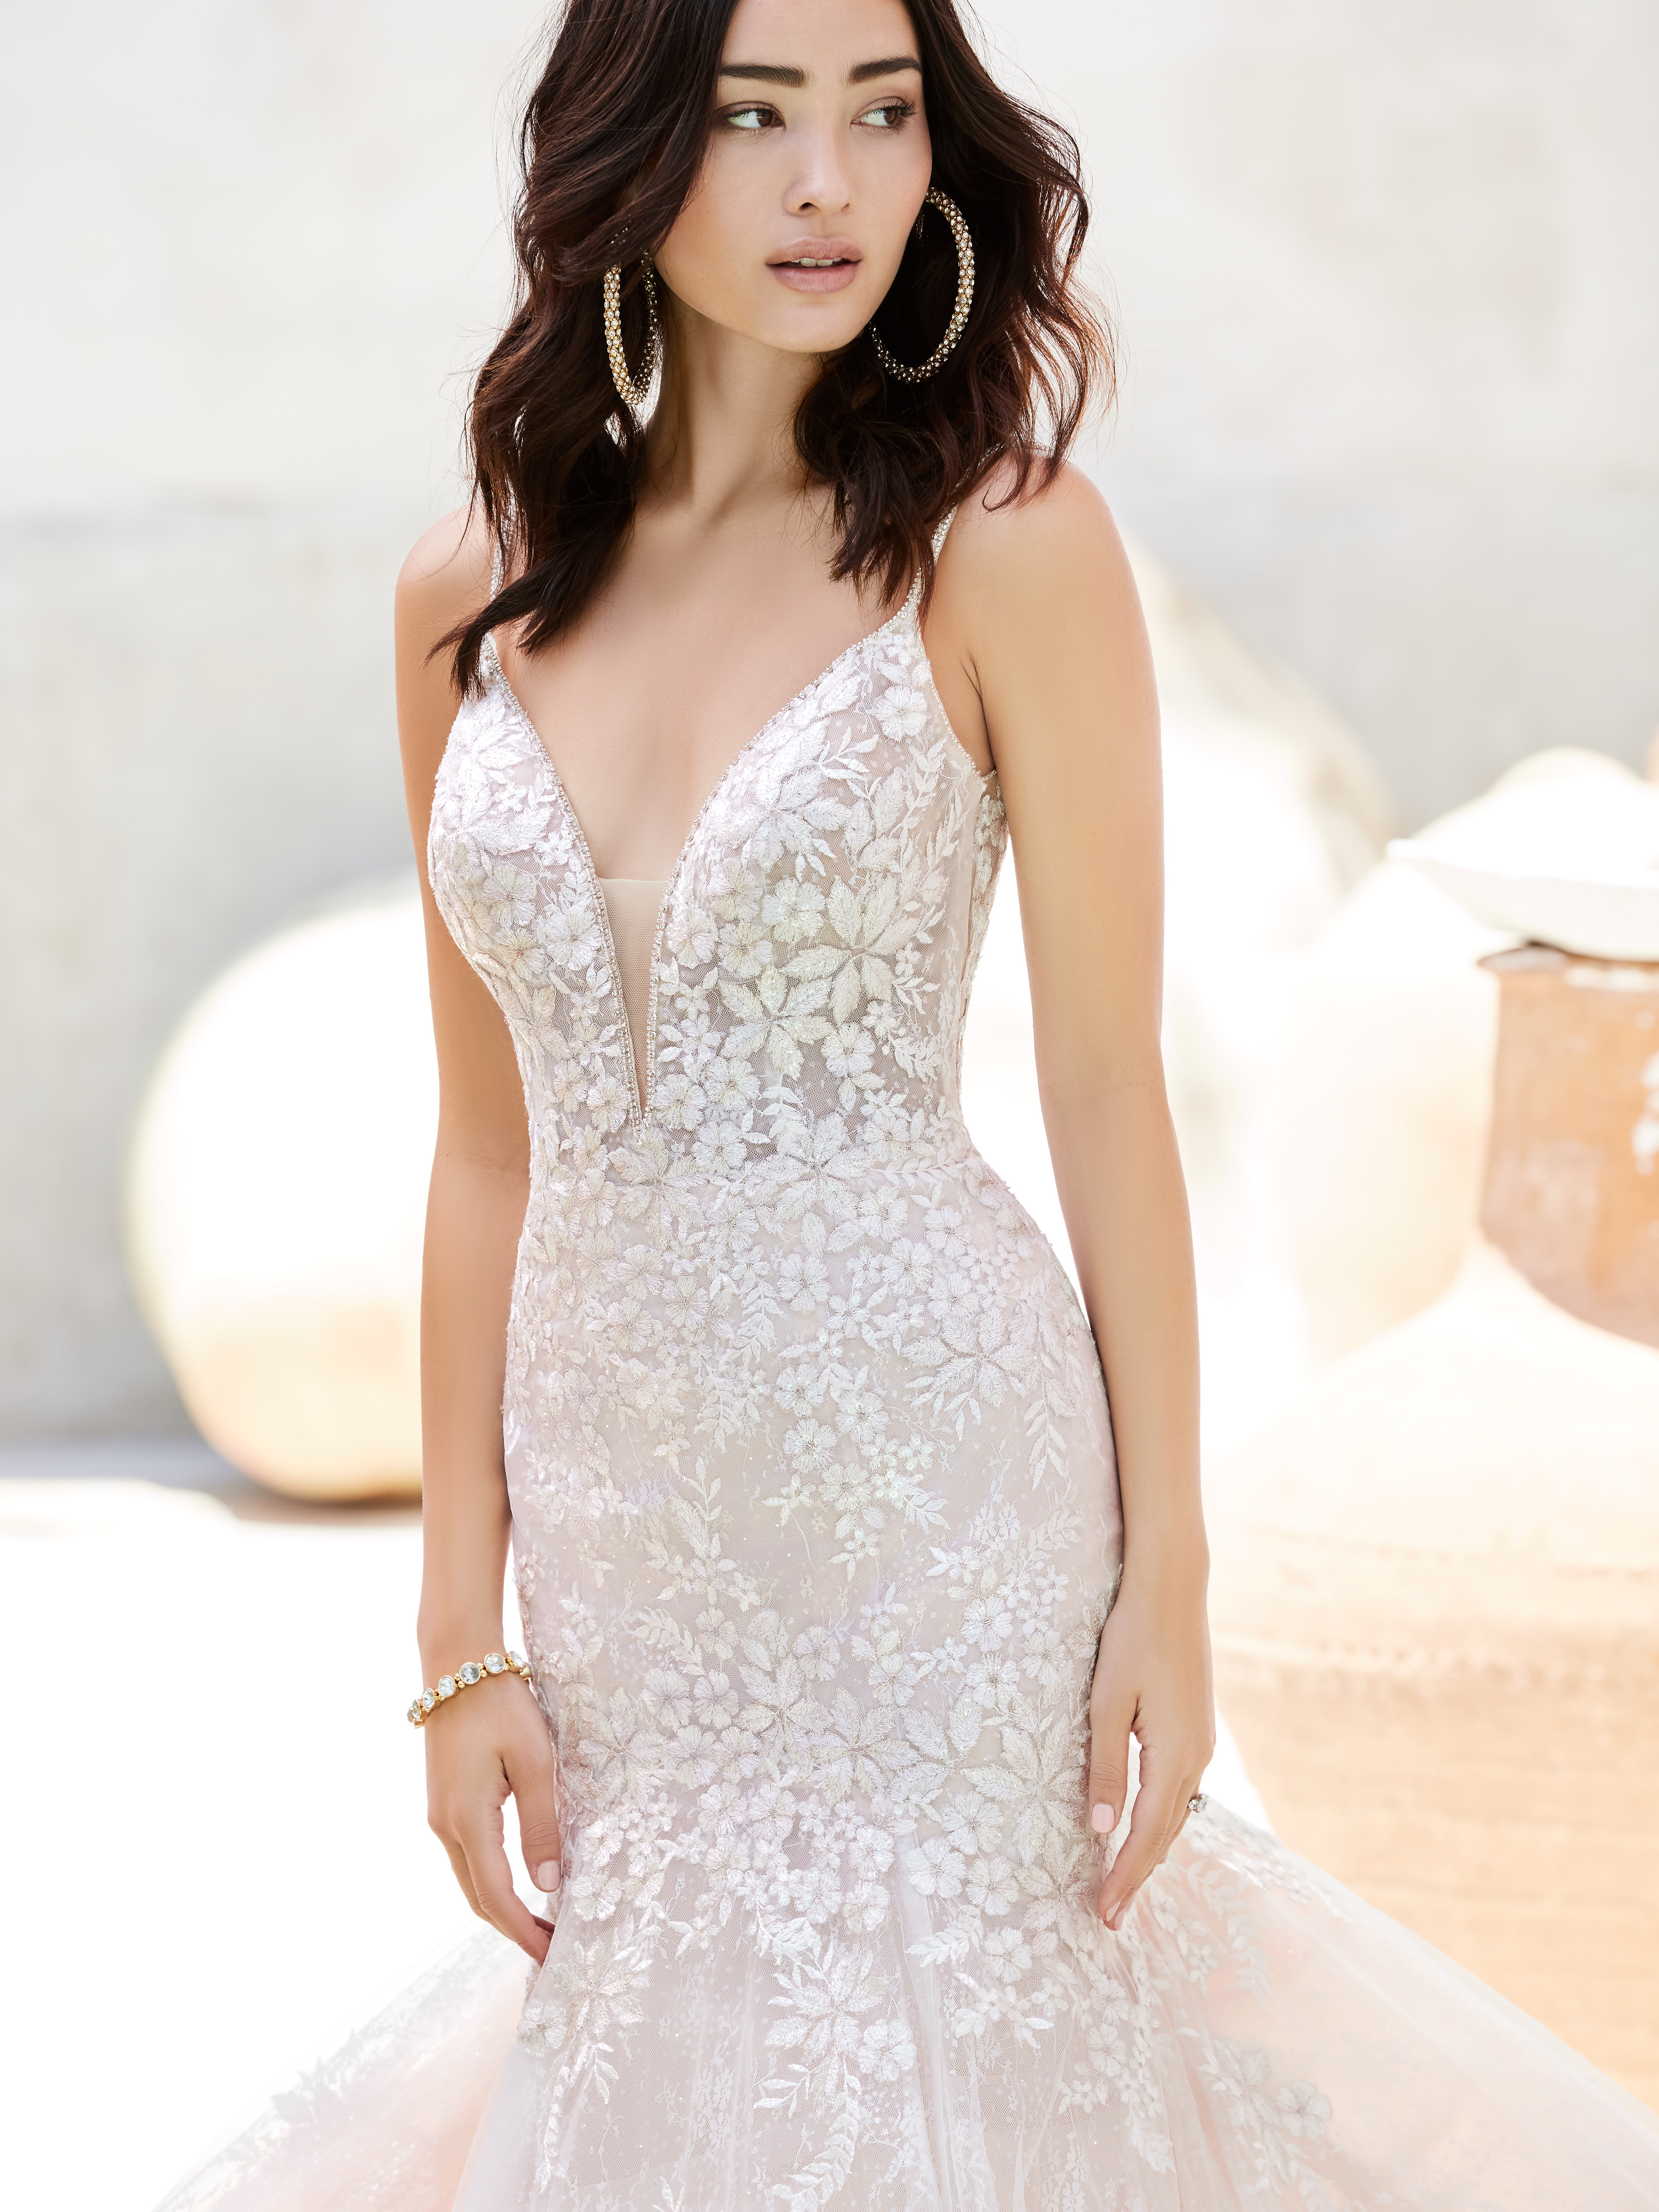 Model Wearing Mermaid Beach Wedding Dress Called Inga by Sottero and Midgley